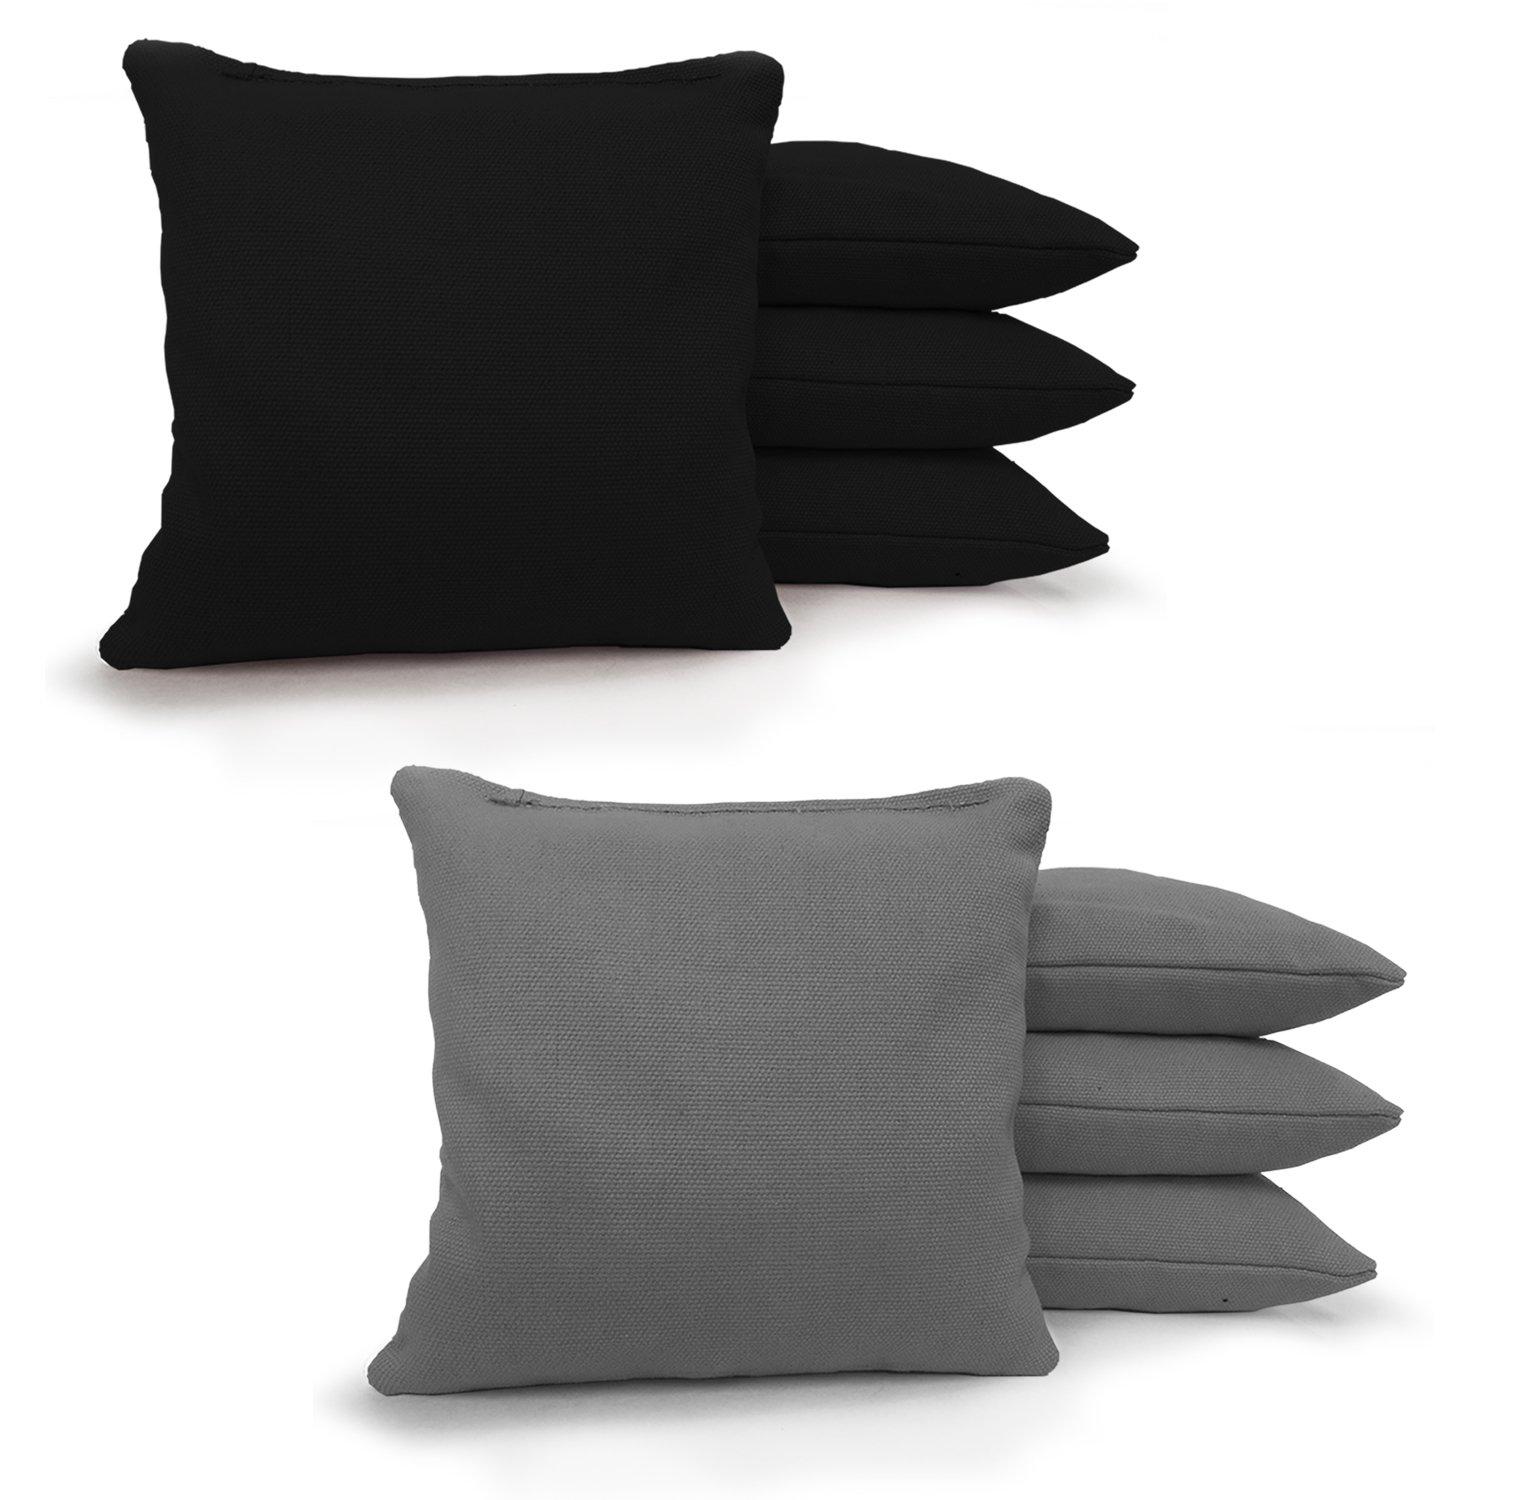 8 Standard Corn Filled Regulation Duck Cloth Cornhole Bags! 17 COLORS (YOU PICK)!! (Black/Grey) by Johnson Enterprises, LLC